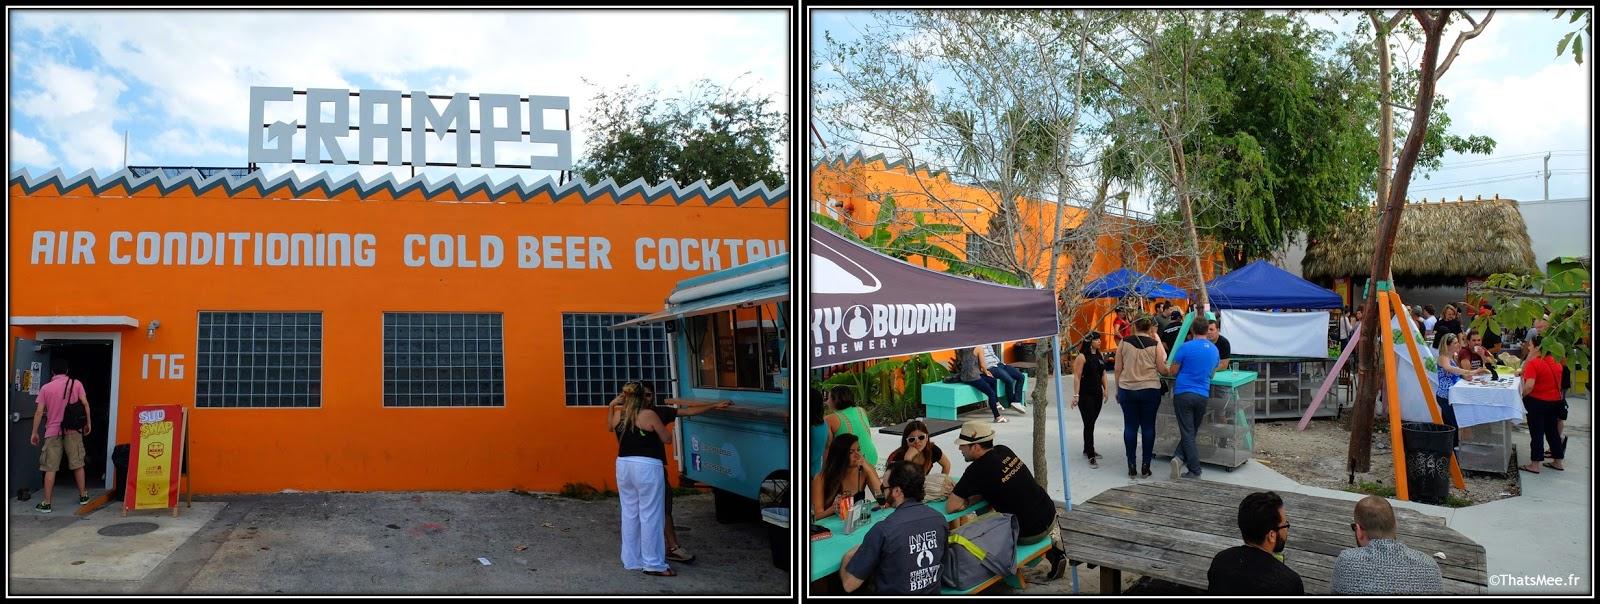 bière fraiche bar Gramps Wynwood Miami, hipster terrasse café bar Gramps foodtruck